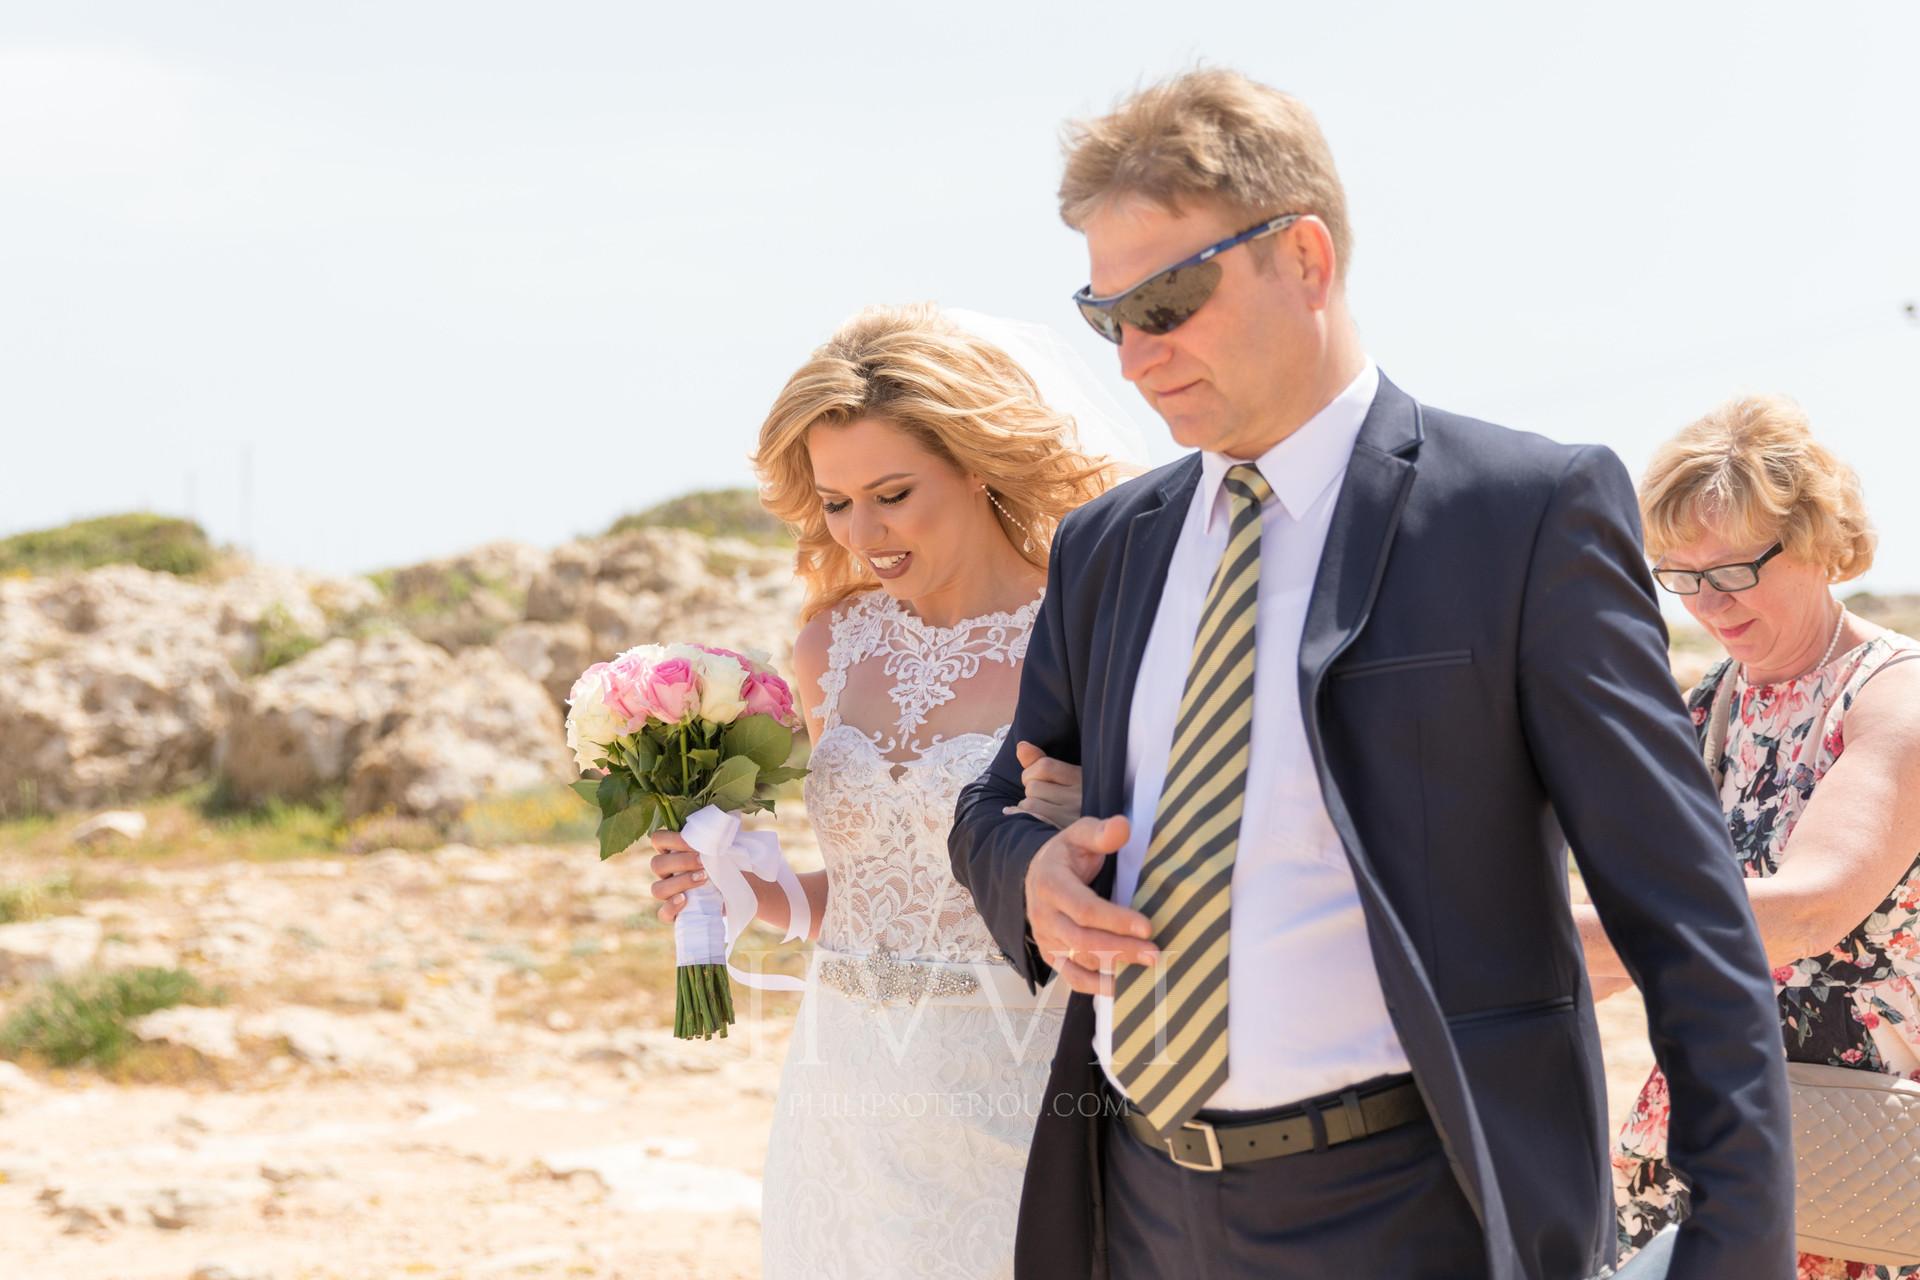 Gintare and Albertui Wedding-6.jpg